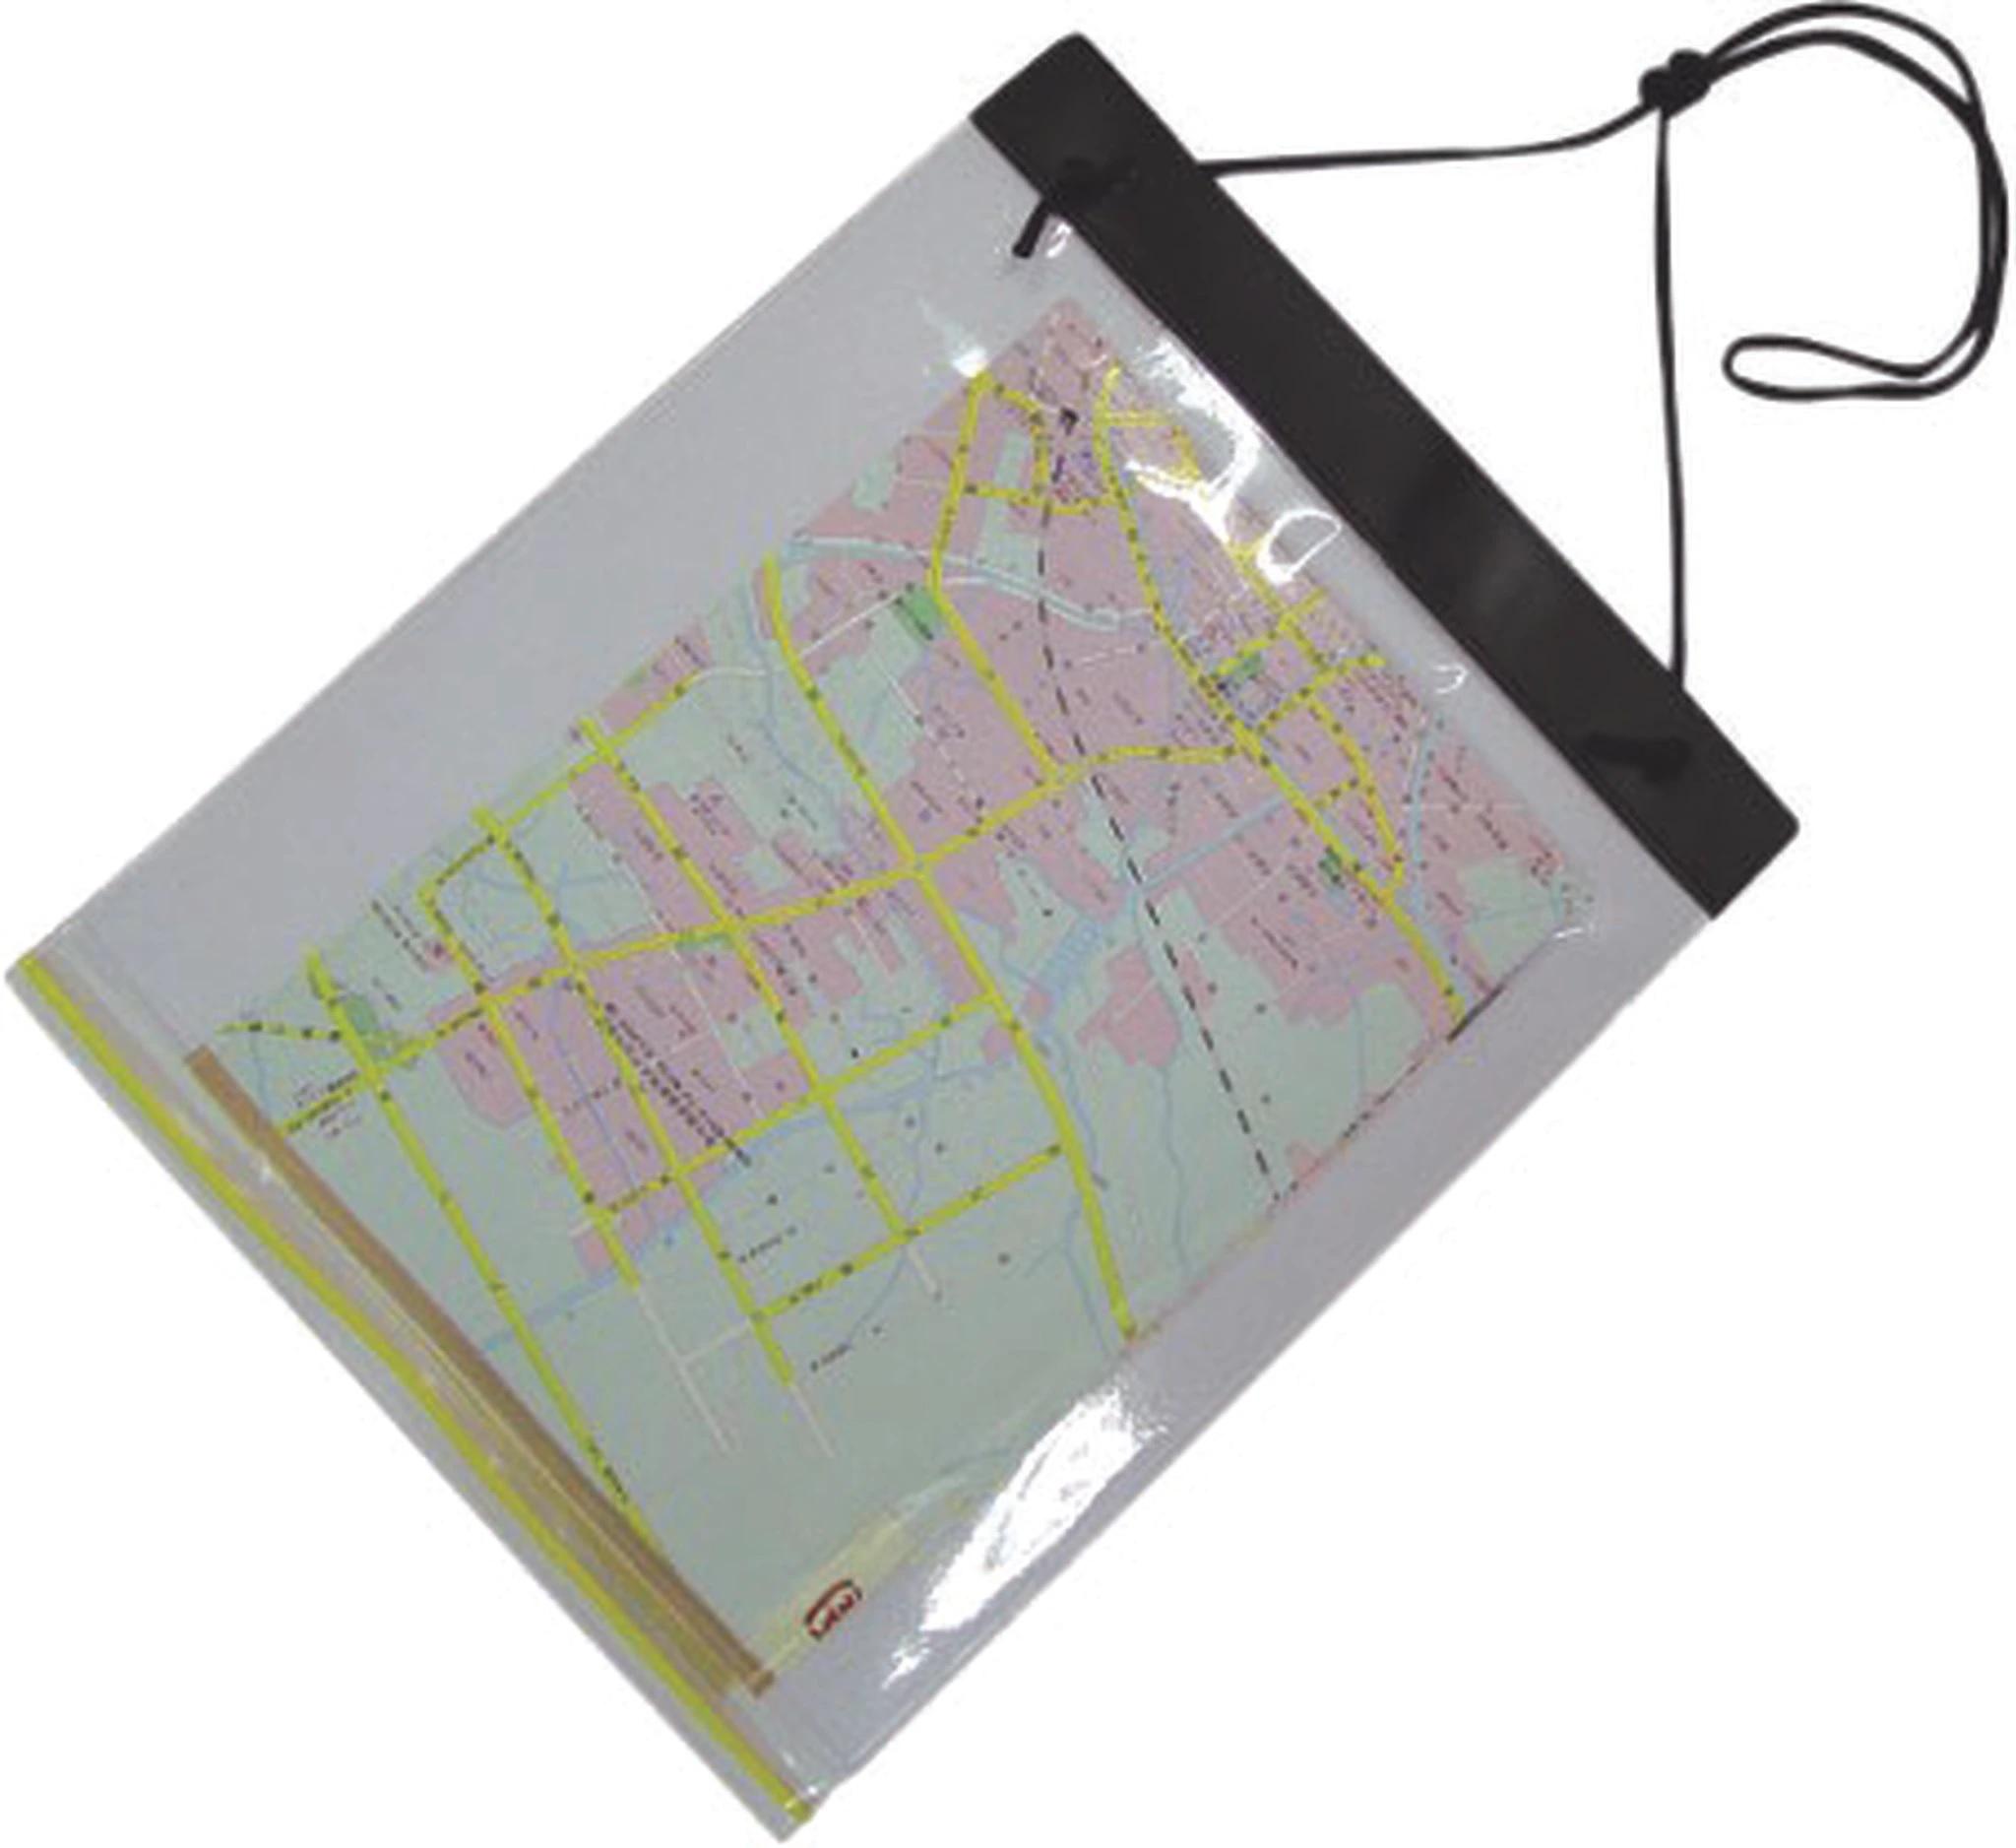 WATERTIGHT MAP CASE